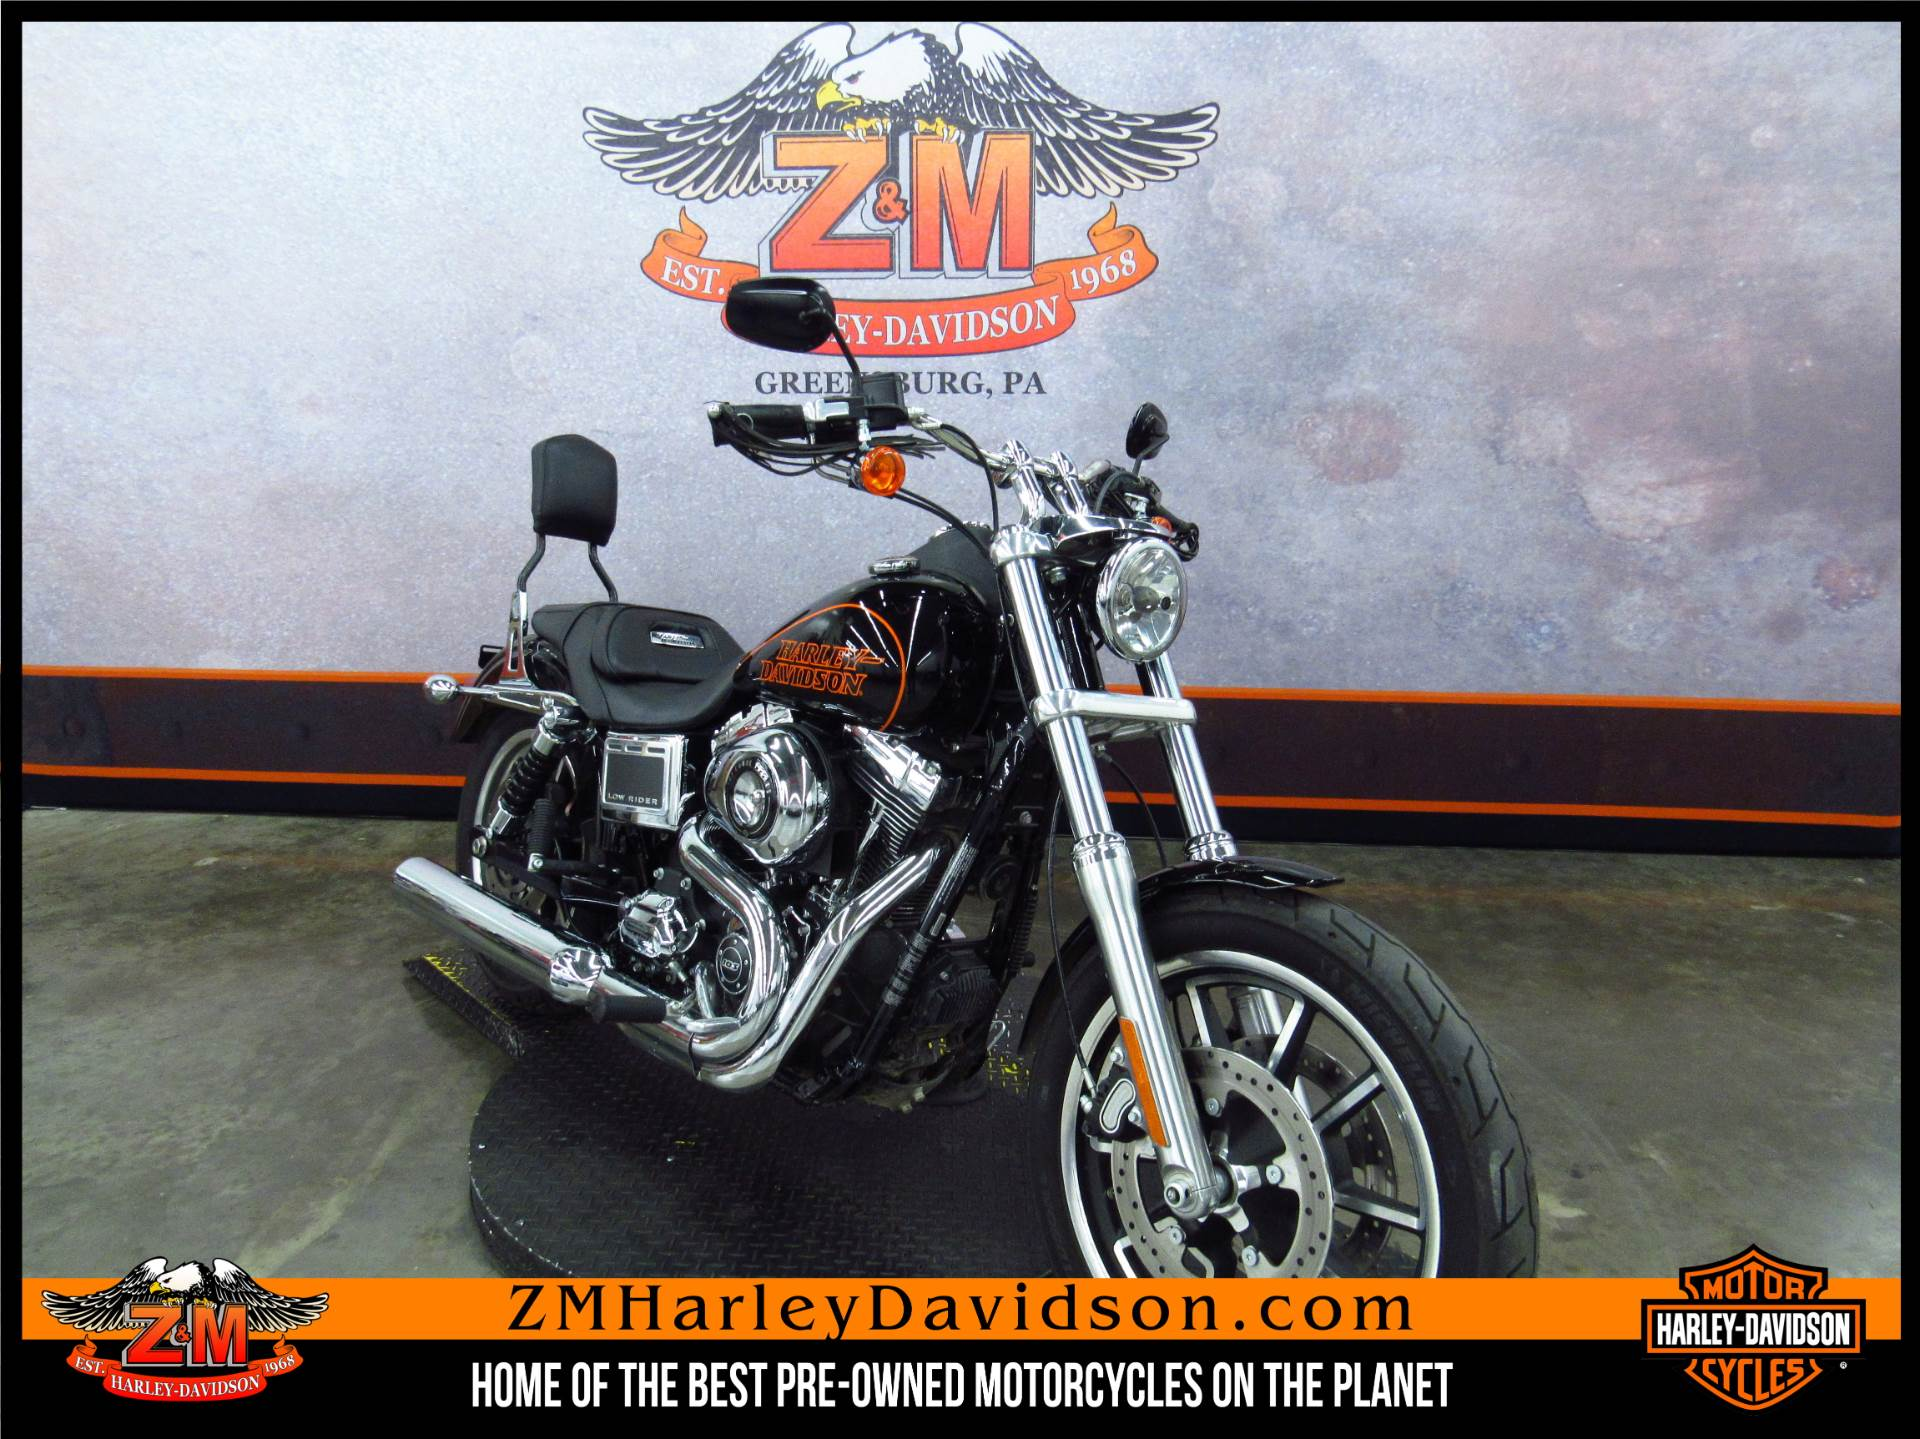 2014 Low Rider